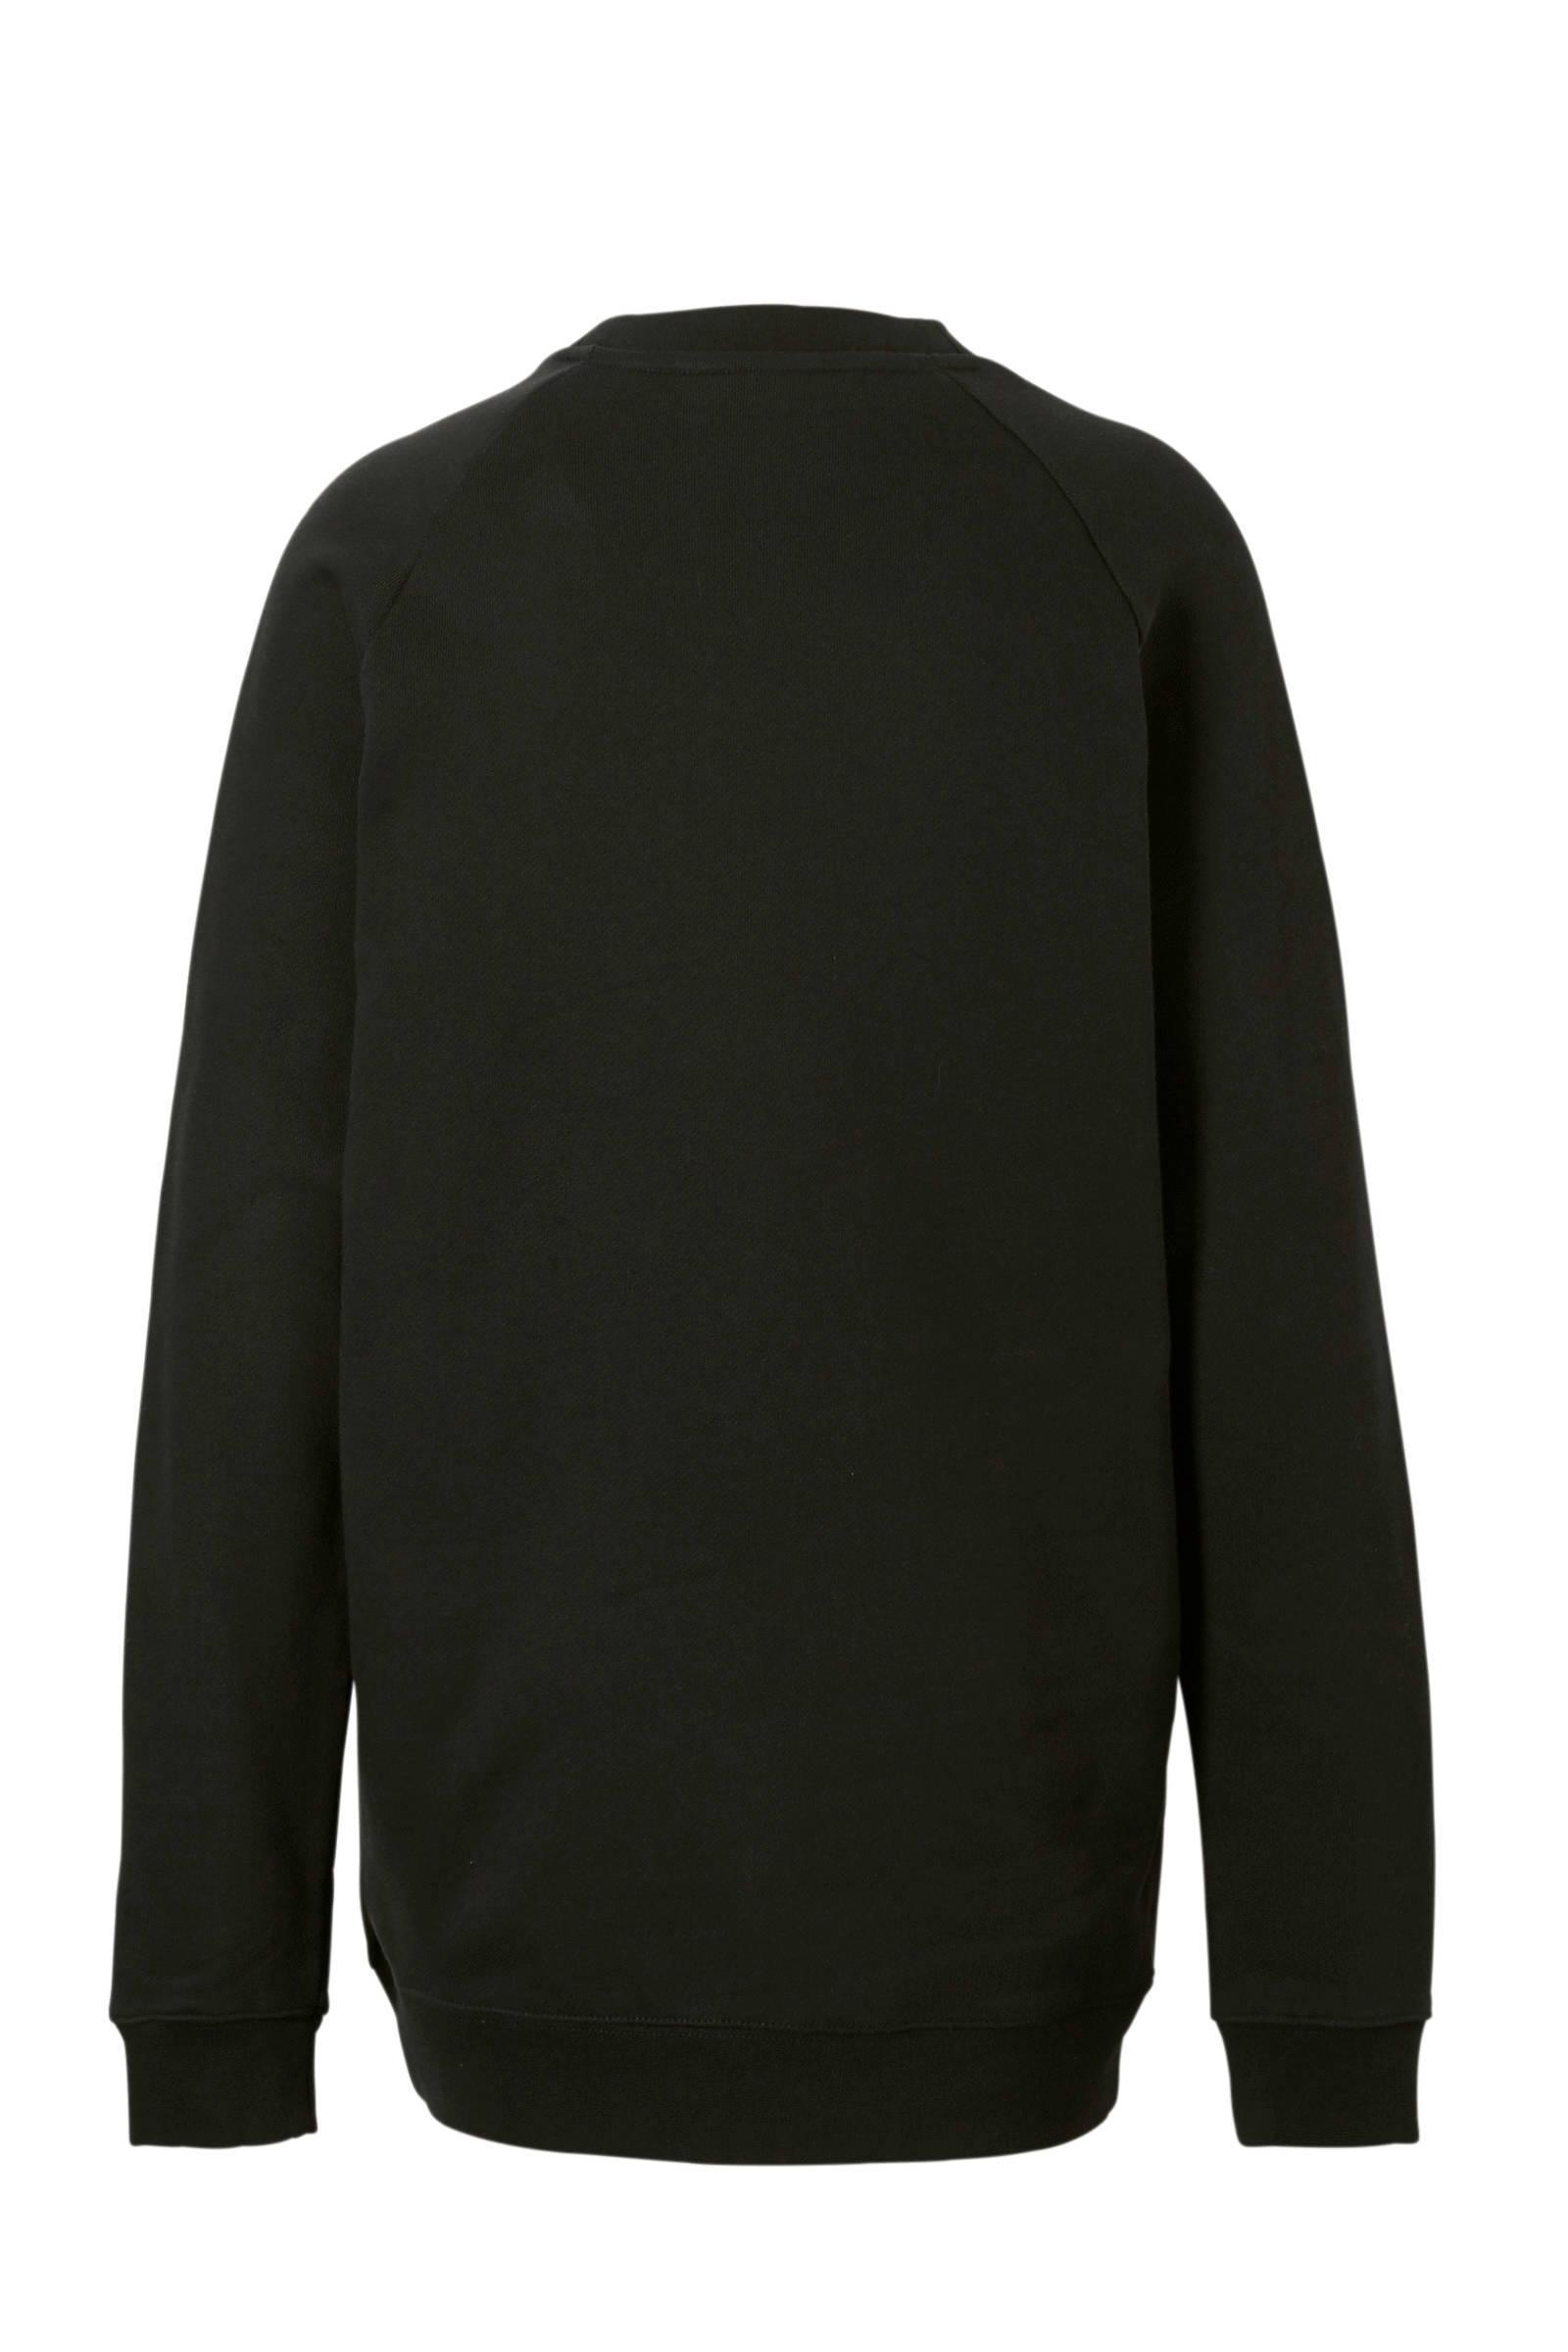 oversized trui zwart dames